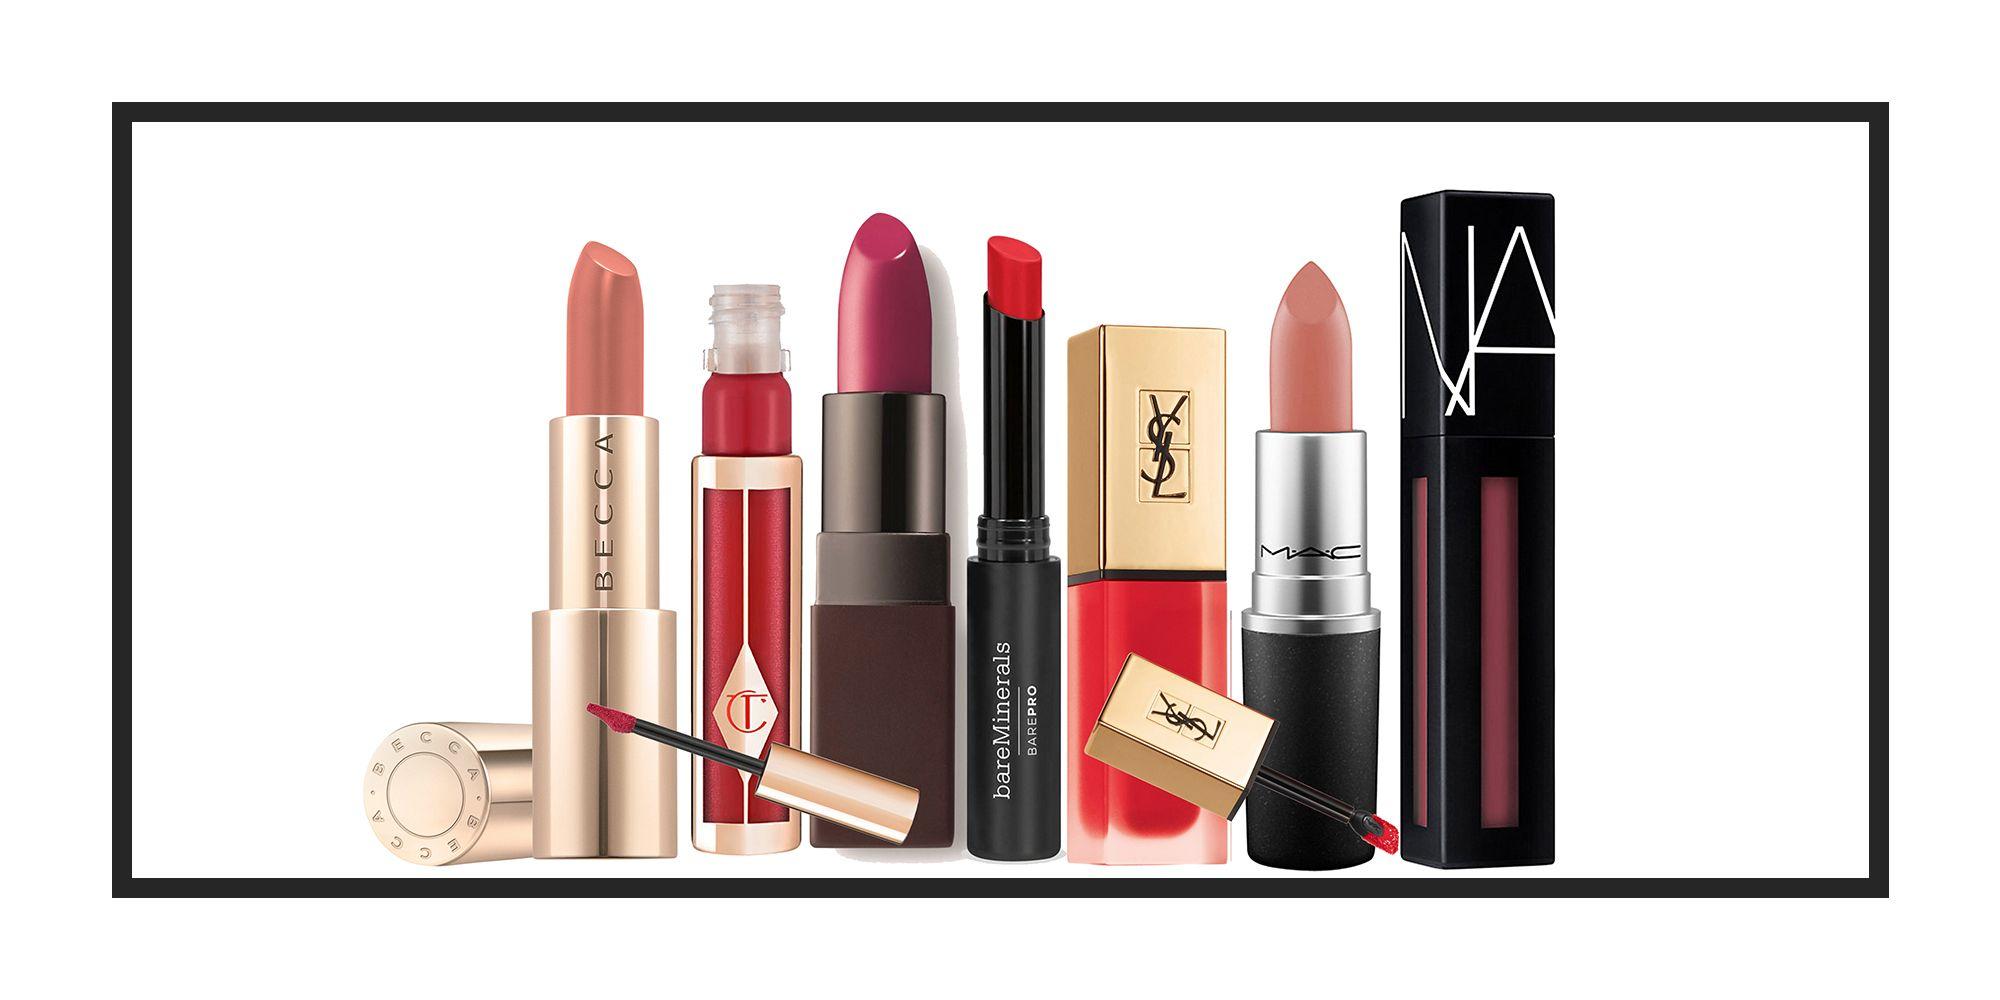 Longlasting lipsticks